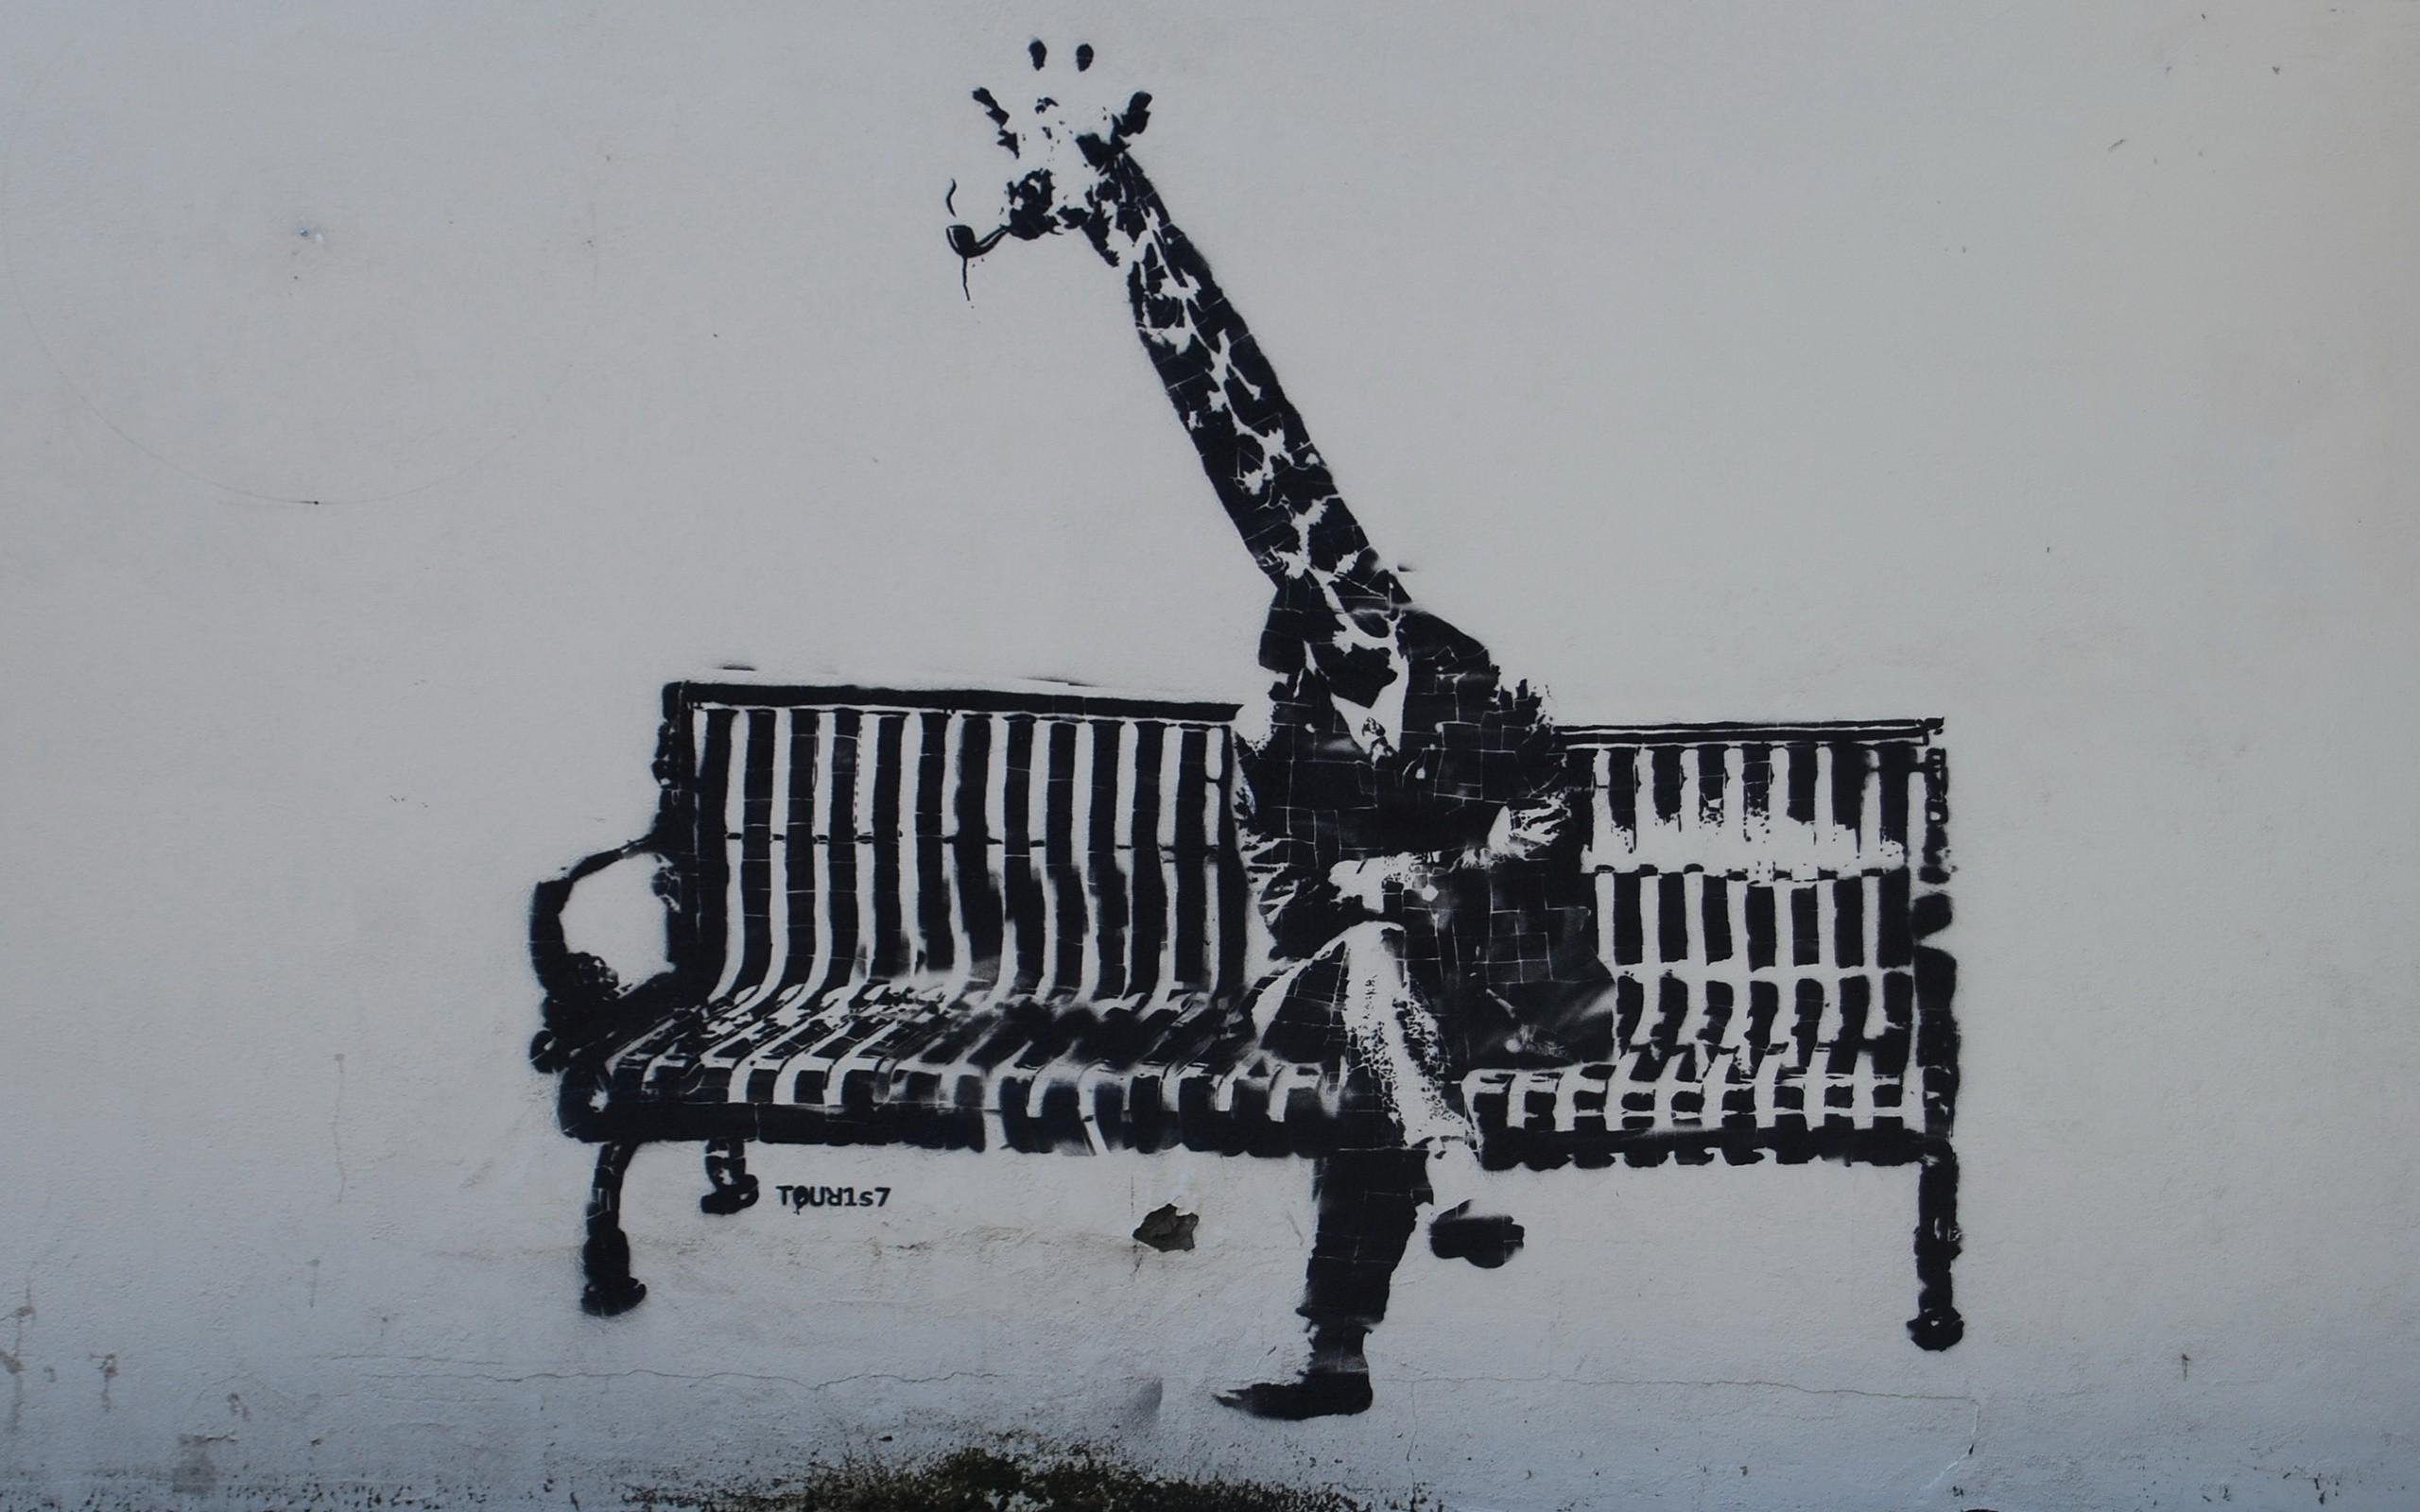 graffiti-giraffes_00288613.jpg